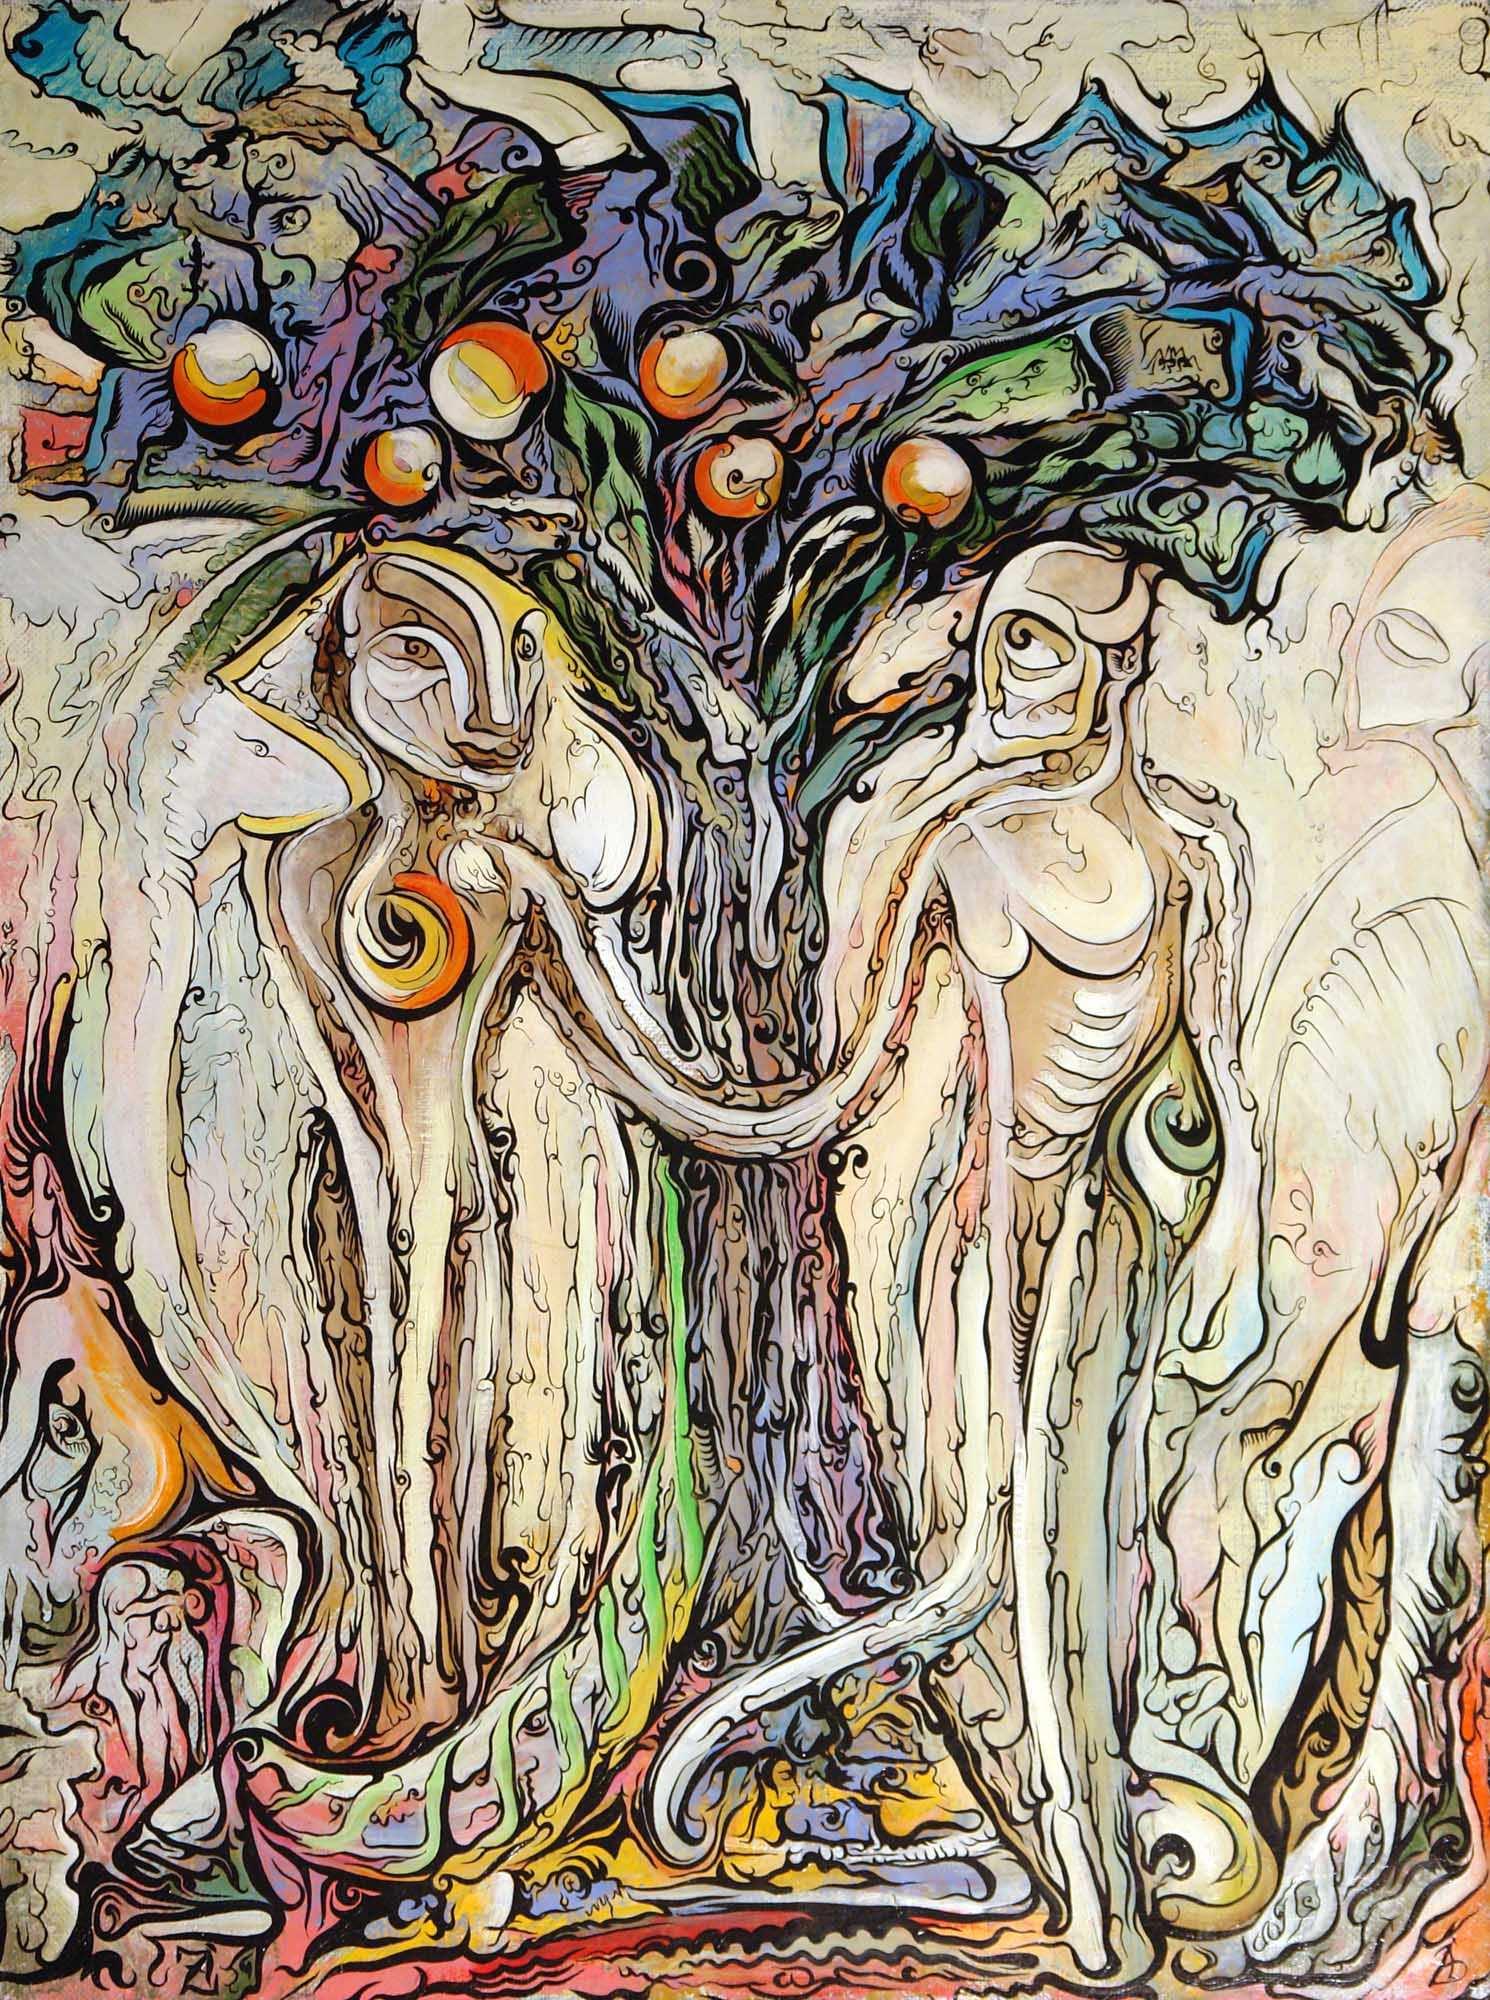 Выставка живописи и графики Армена Захаряна «Послание», 16+